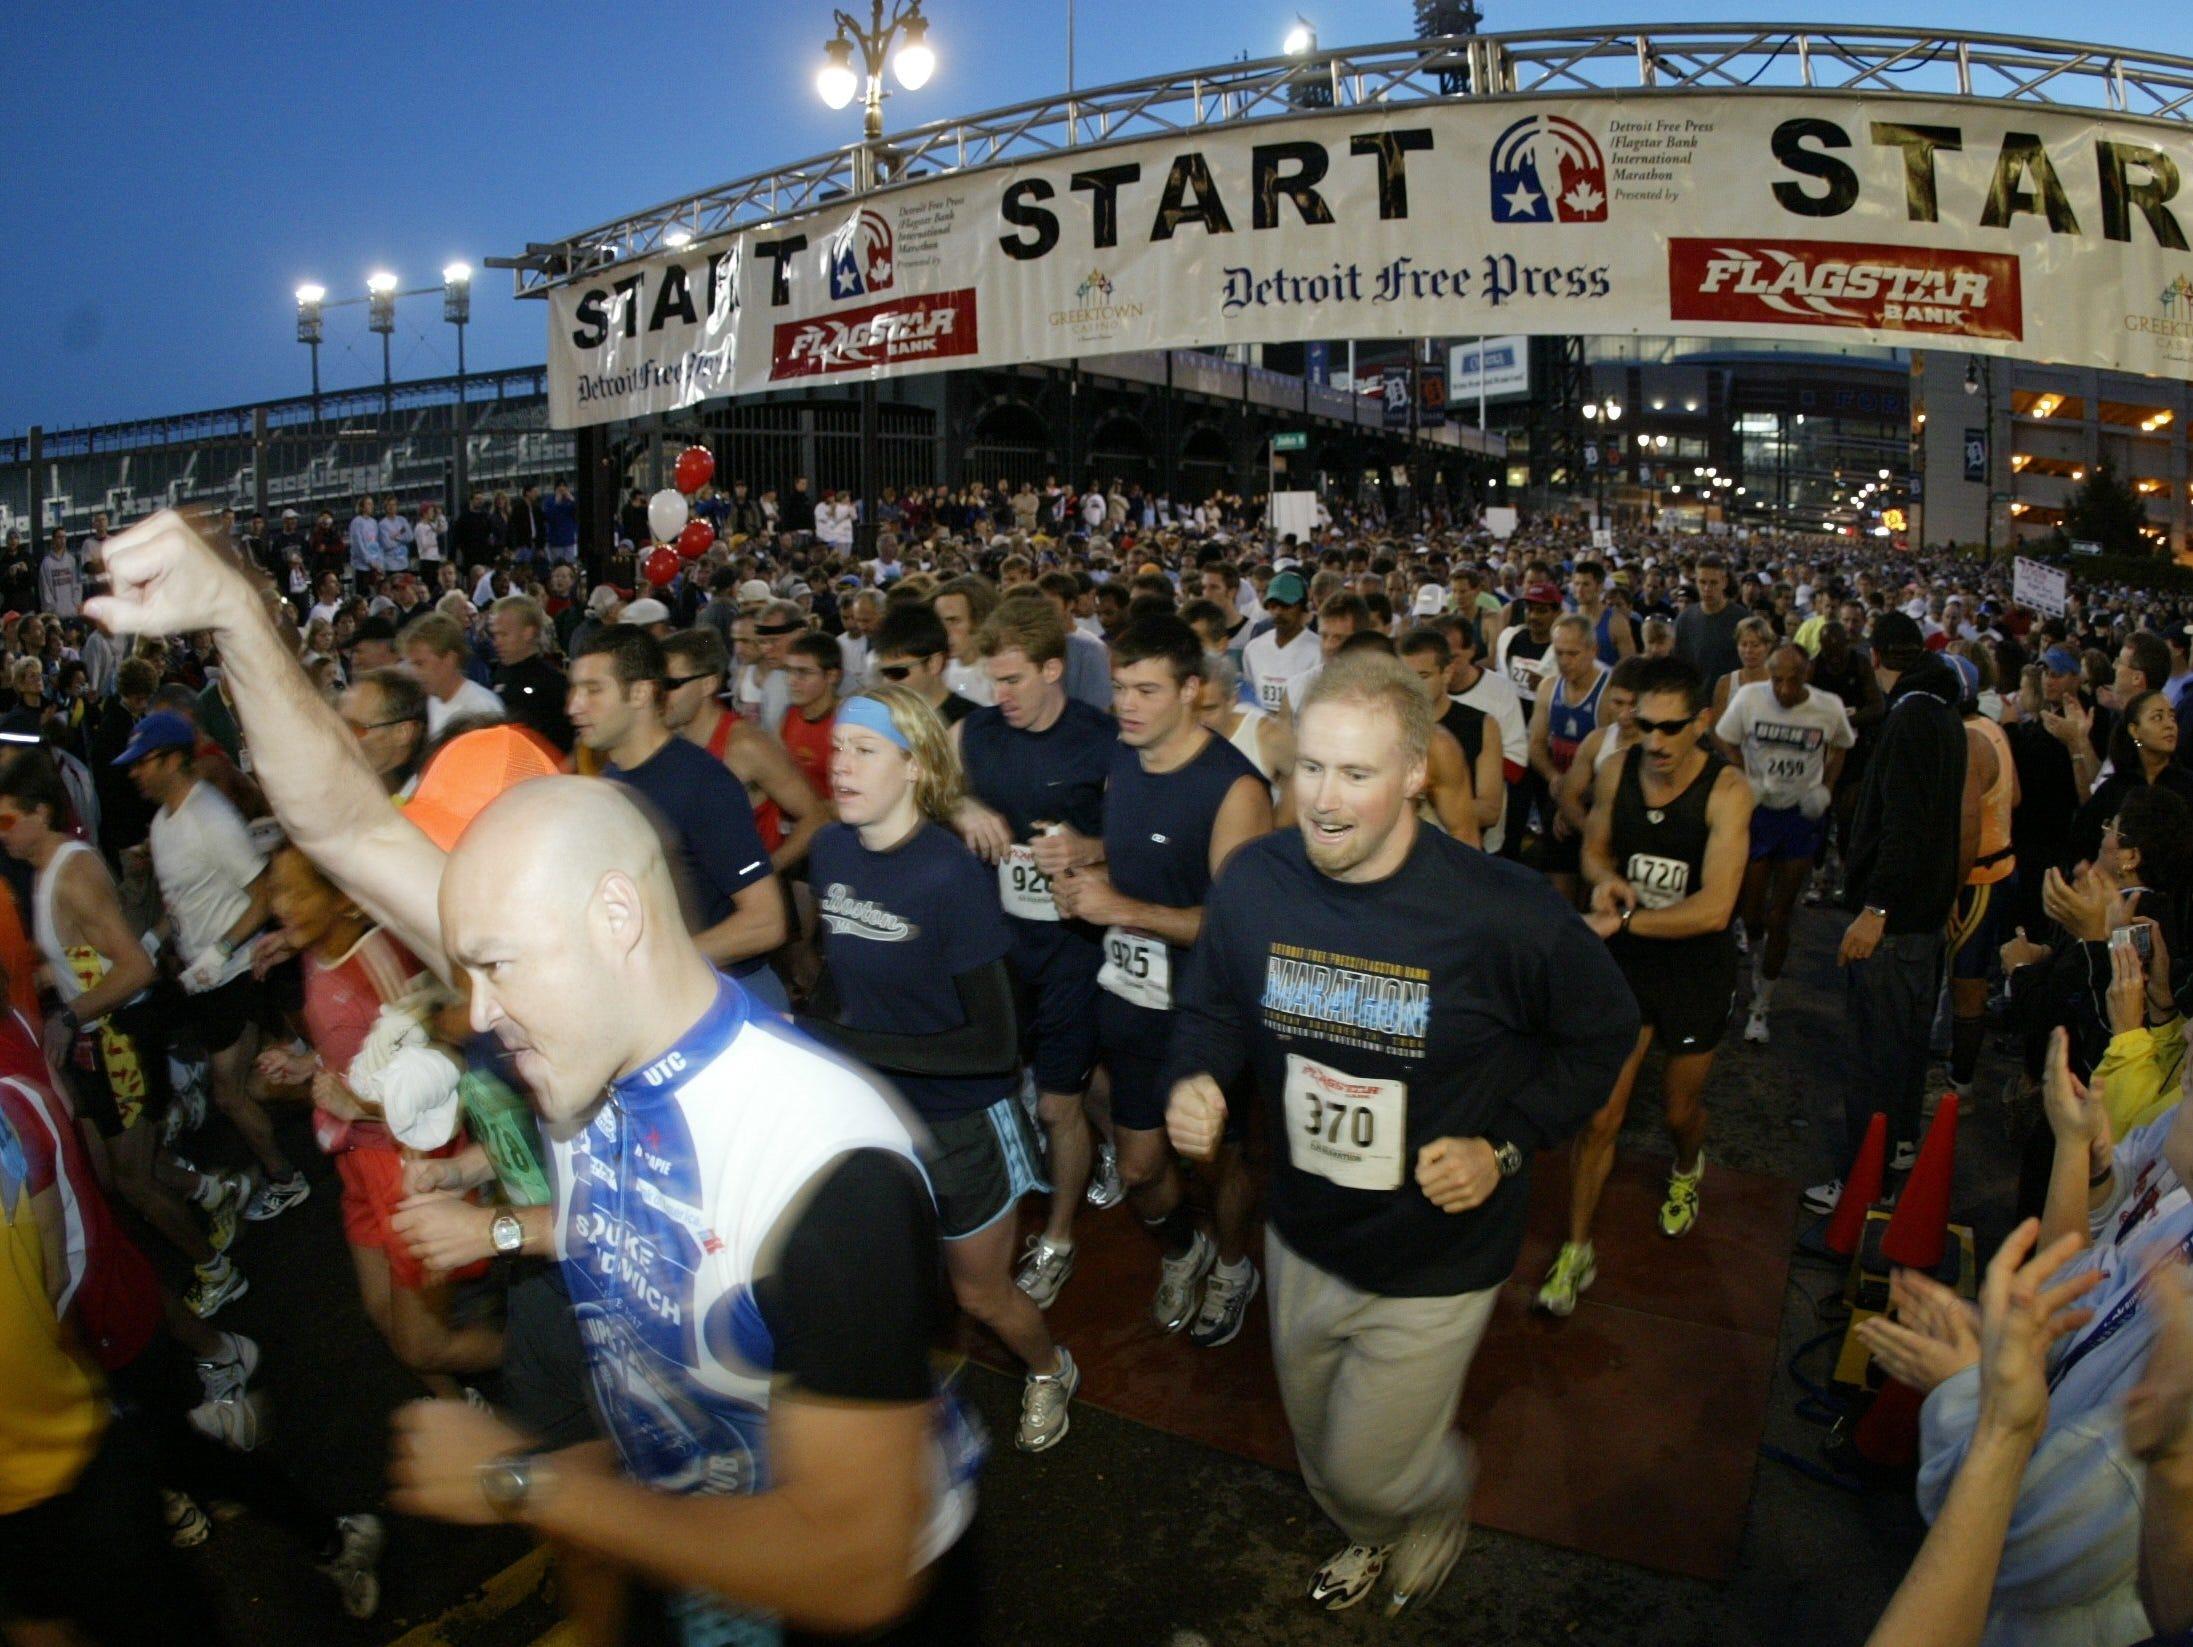 Marathoners, half marathoners and relay teams members run under the start banner next Comerica Park at the start of the 27th annual Detroit Free Press Marathon, Sunday, October 24, 2004 in Detroit, MI.